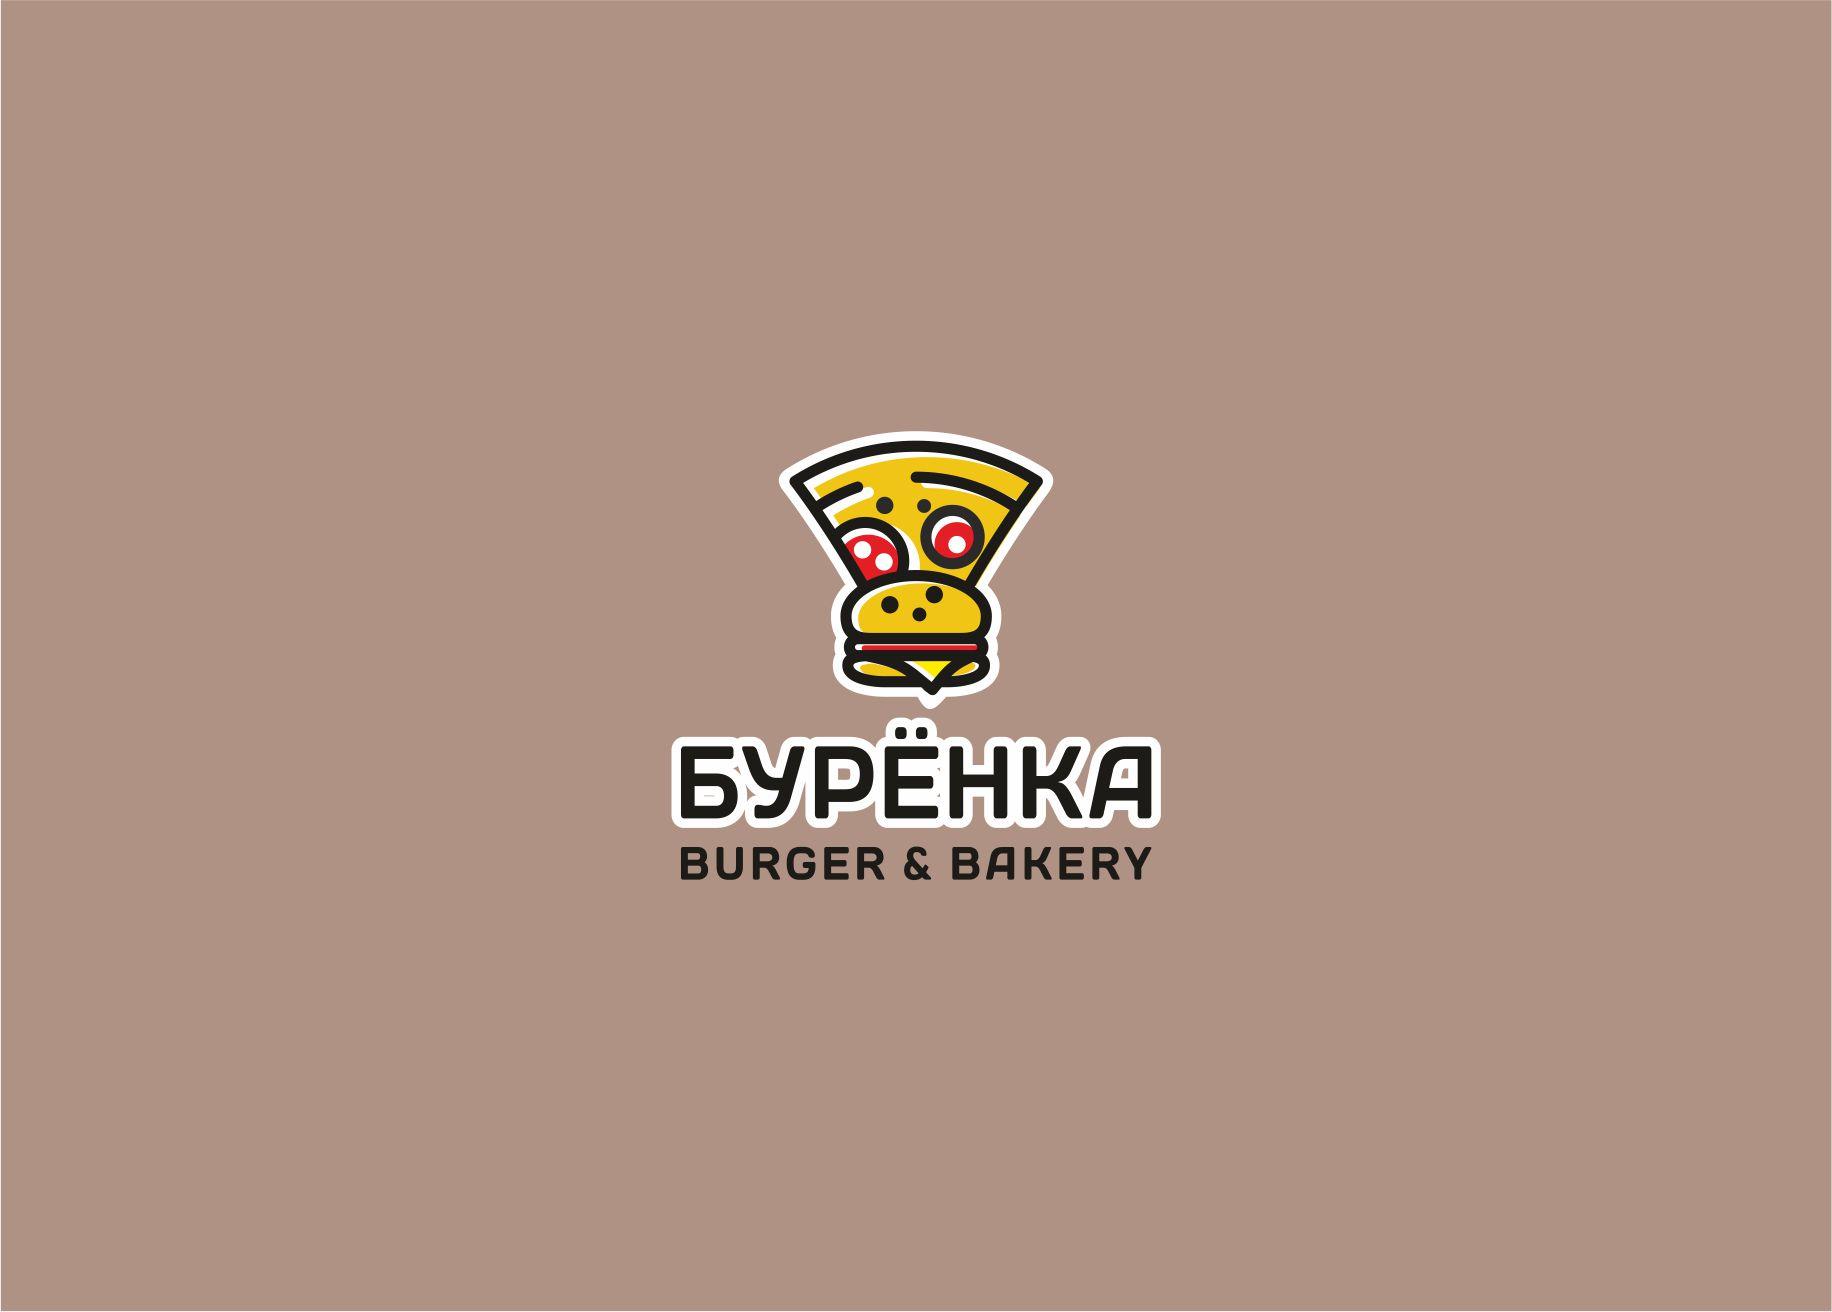 Логотип для Бургерной с Пекарней фото f_8965e10cd2846131.jpg